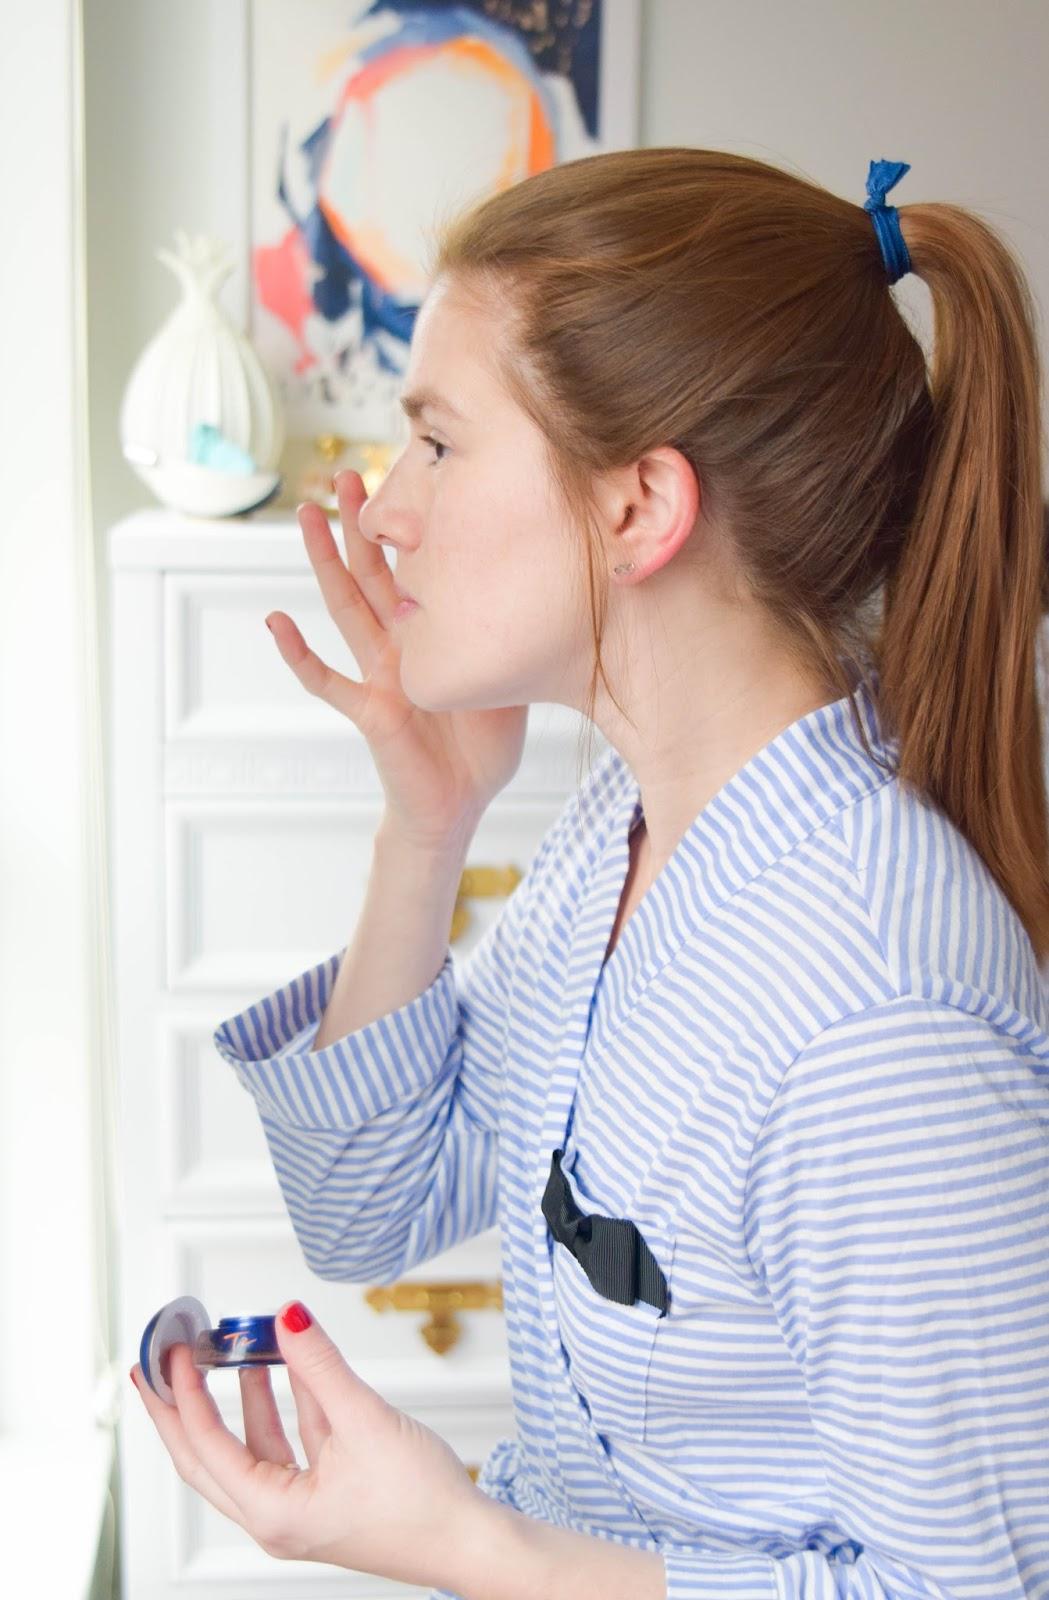 Taking Care of Your Skin: Always Use Eye Cream